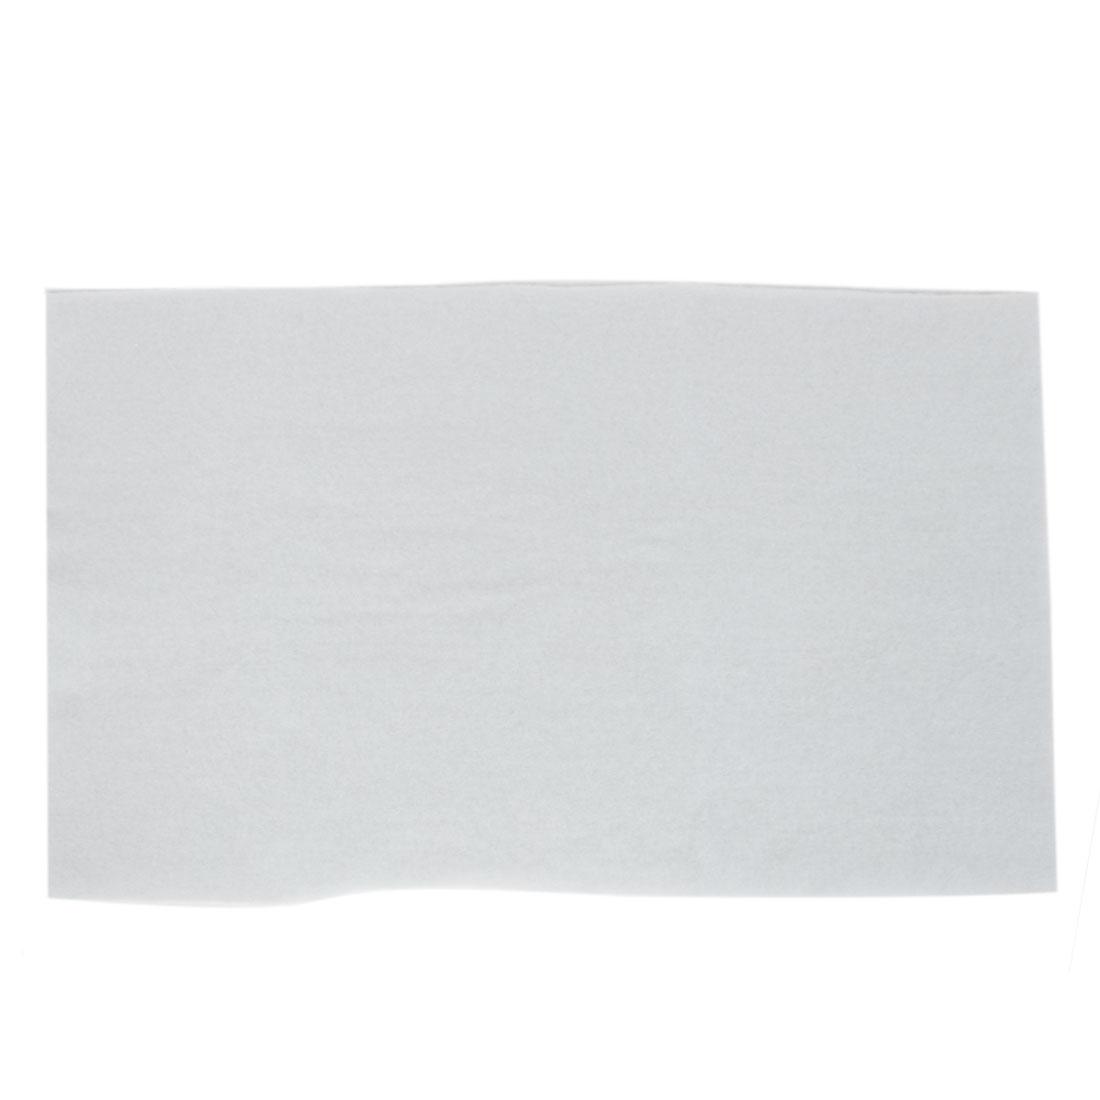 Aquarium Rectangle Sponge Biochemical Fresh Water Filter 58 x 41 x 1cm White